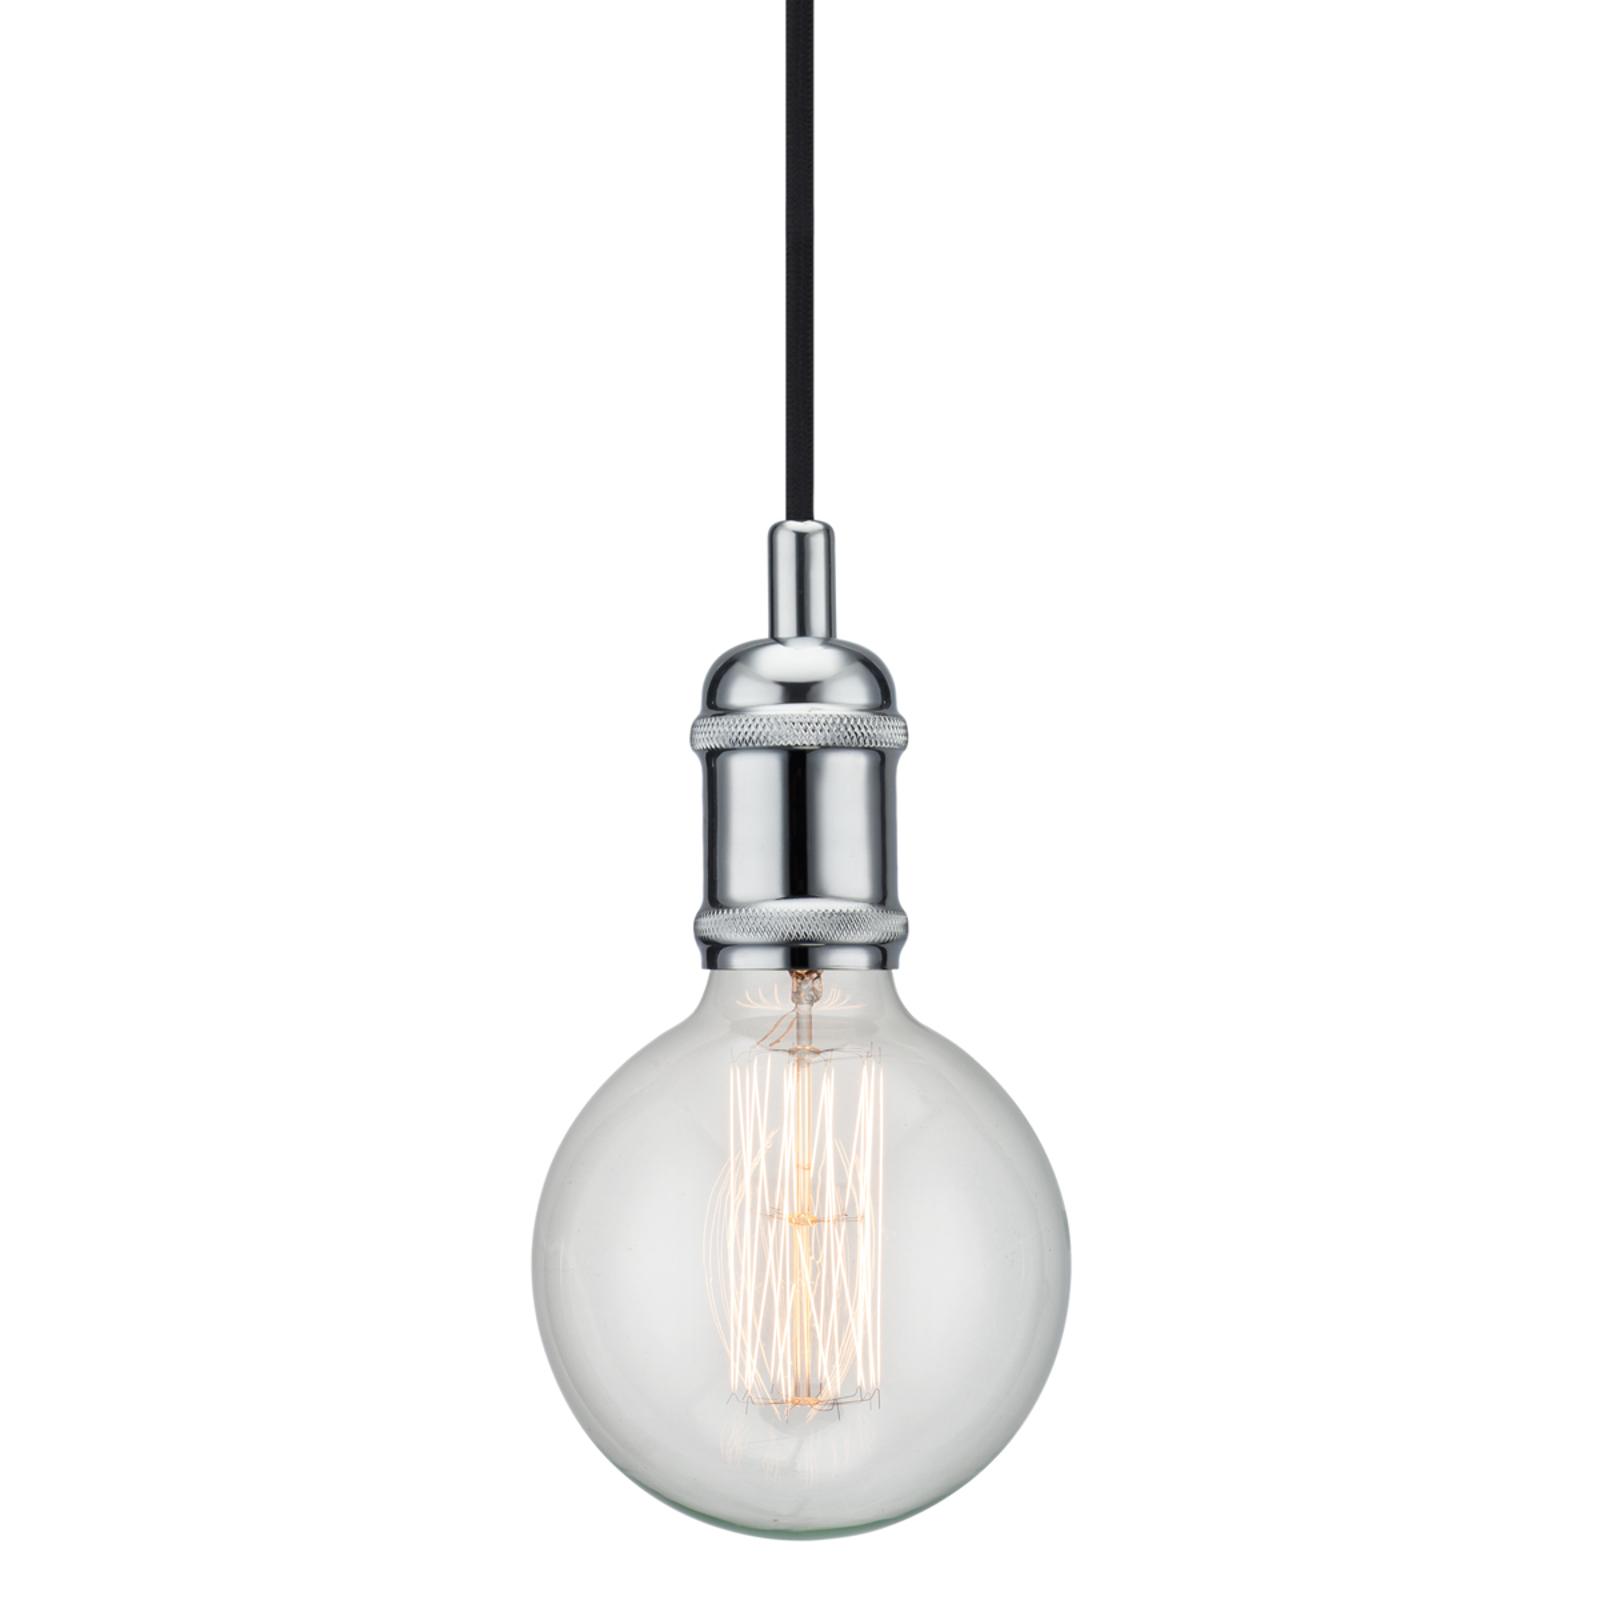 Avra - minimalistische hanglamp in chroom